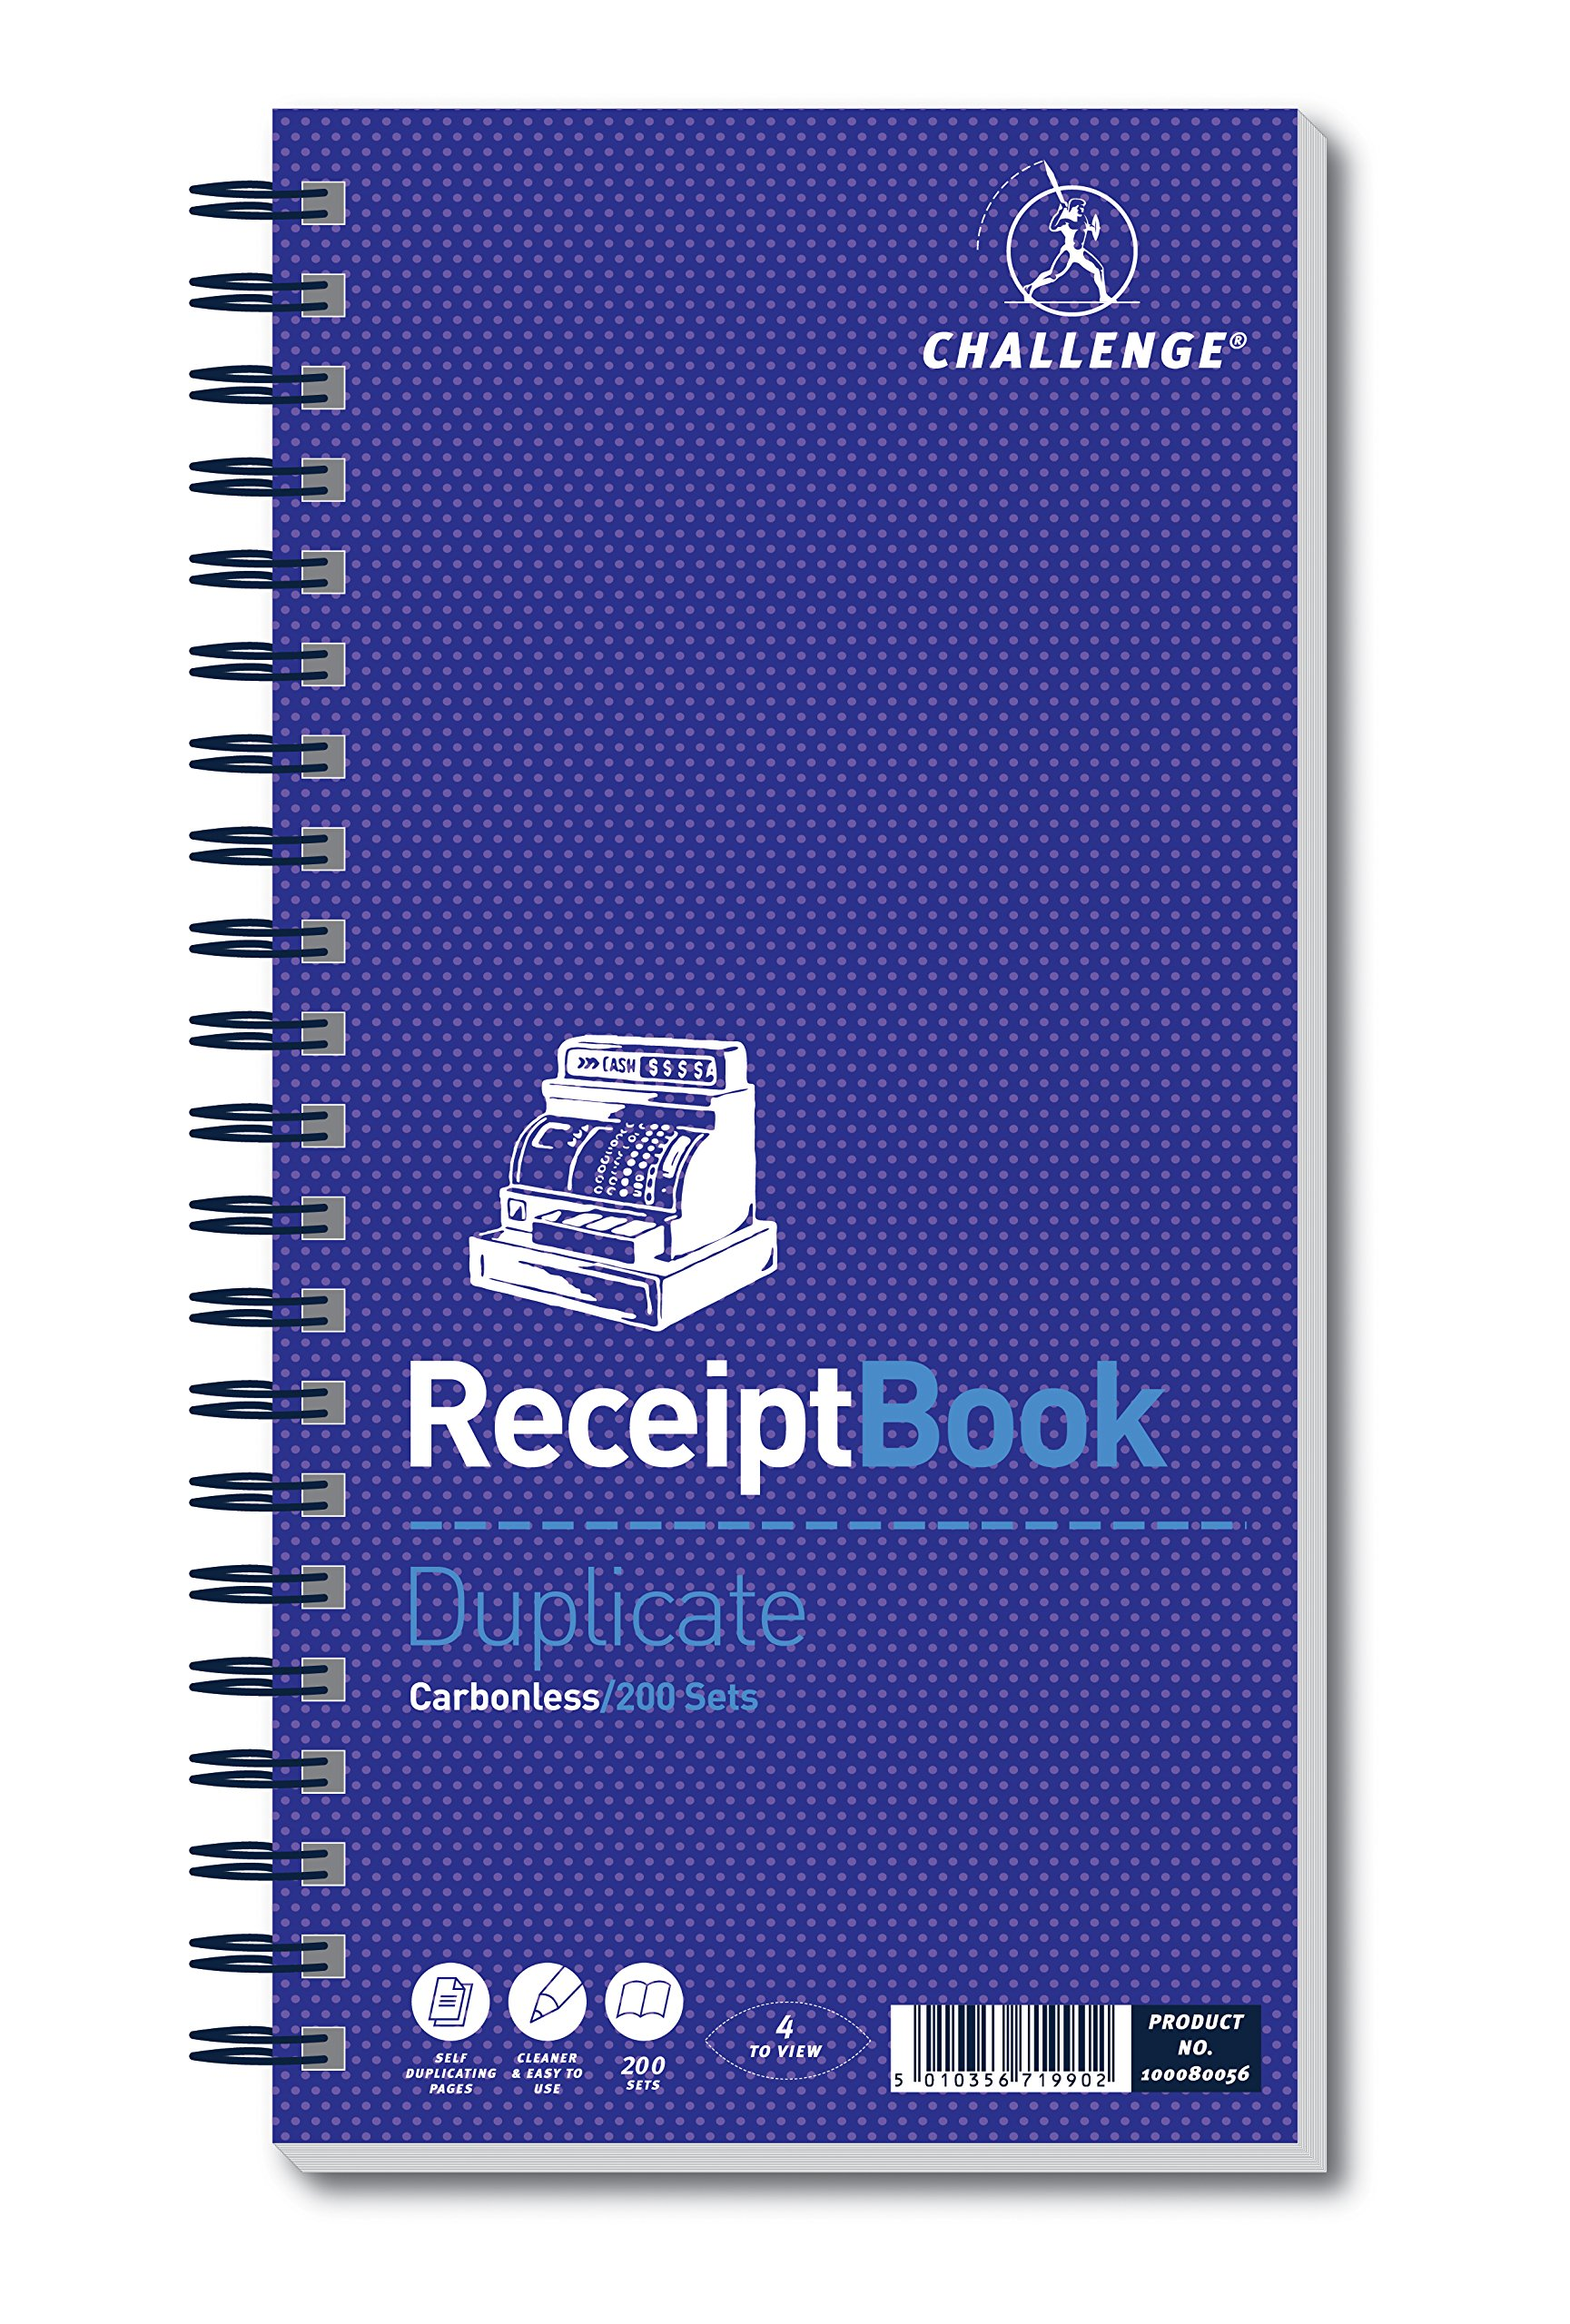 CHALLENGE DUPLICATE BOOK RECEIPT 280X152